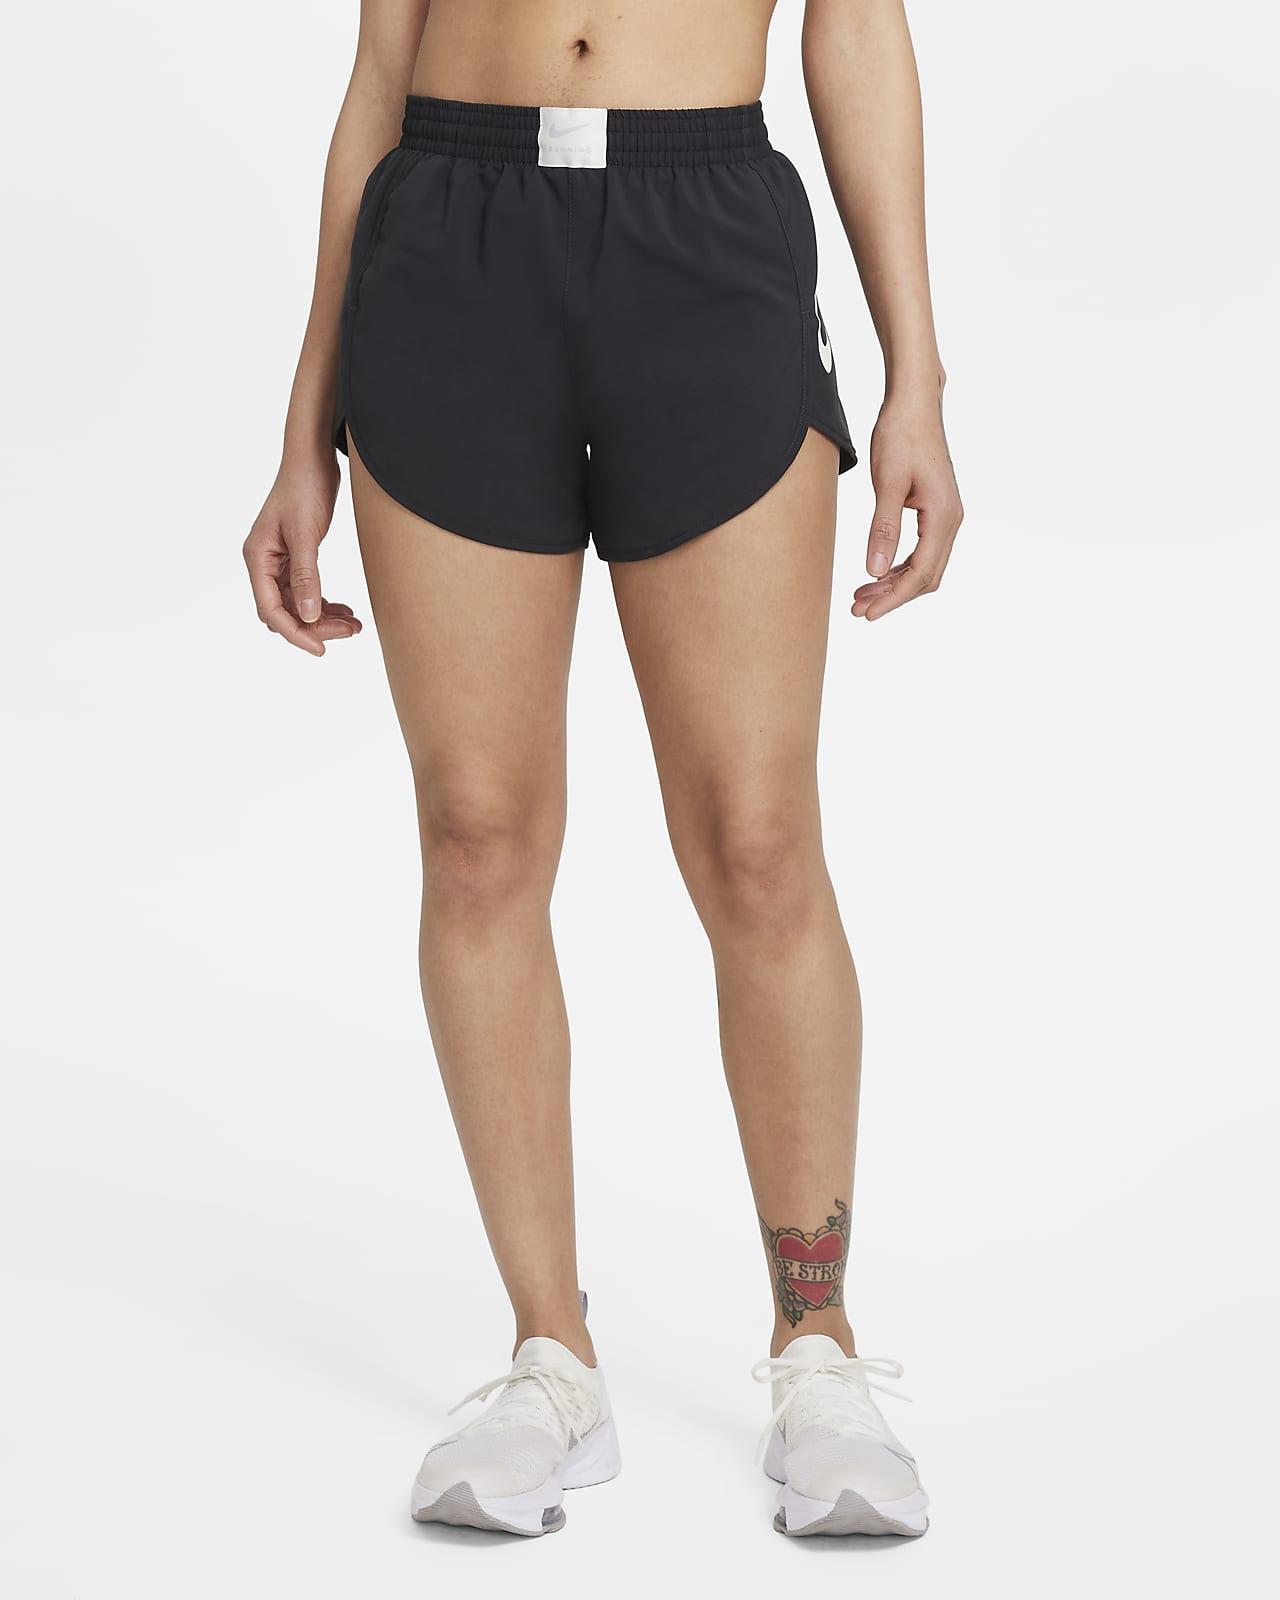 Shorts de running con ropa interior forrada para mujer Nike Dri-FIT Retro